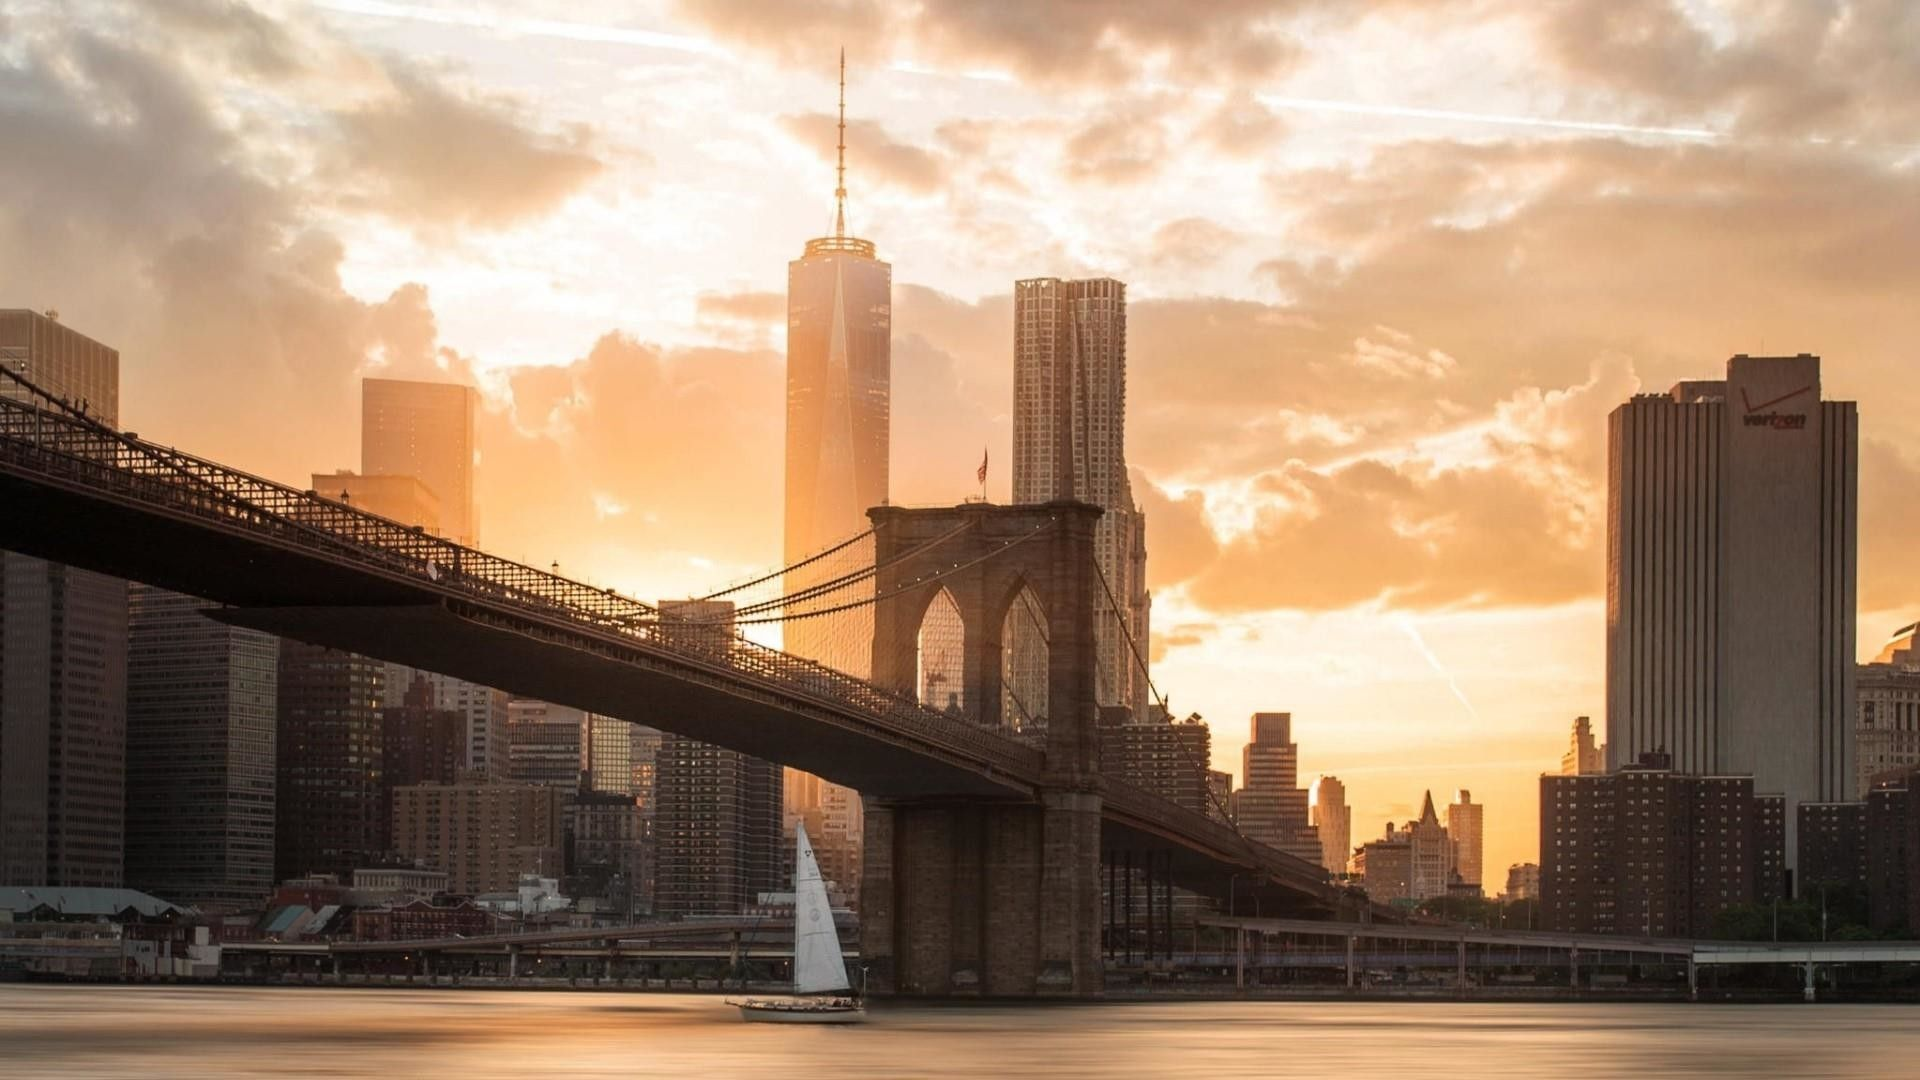 Brooklyn Bridge Hd Wallpapers Top Free Brooklyn Bridge Hd